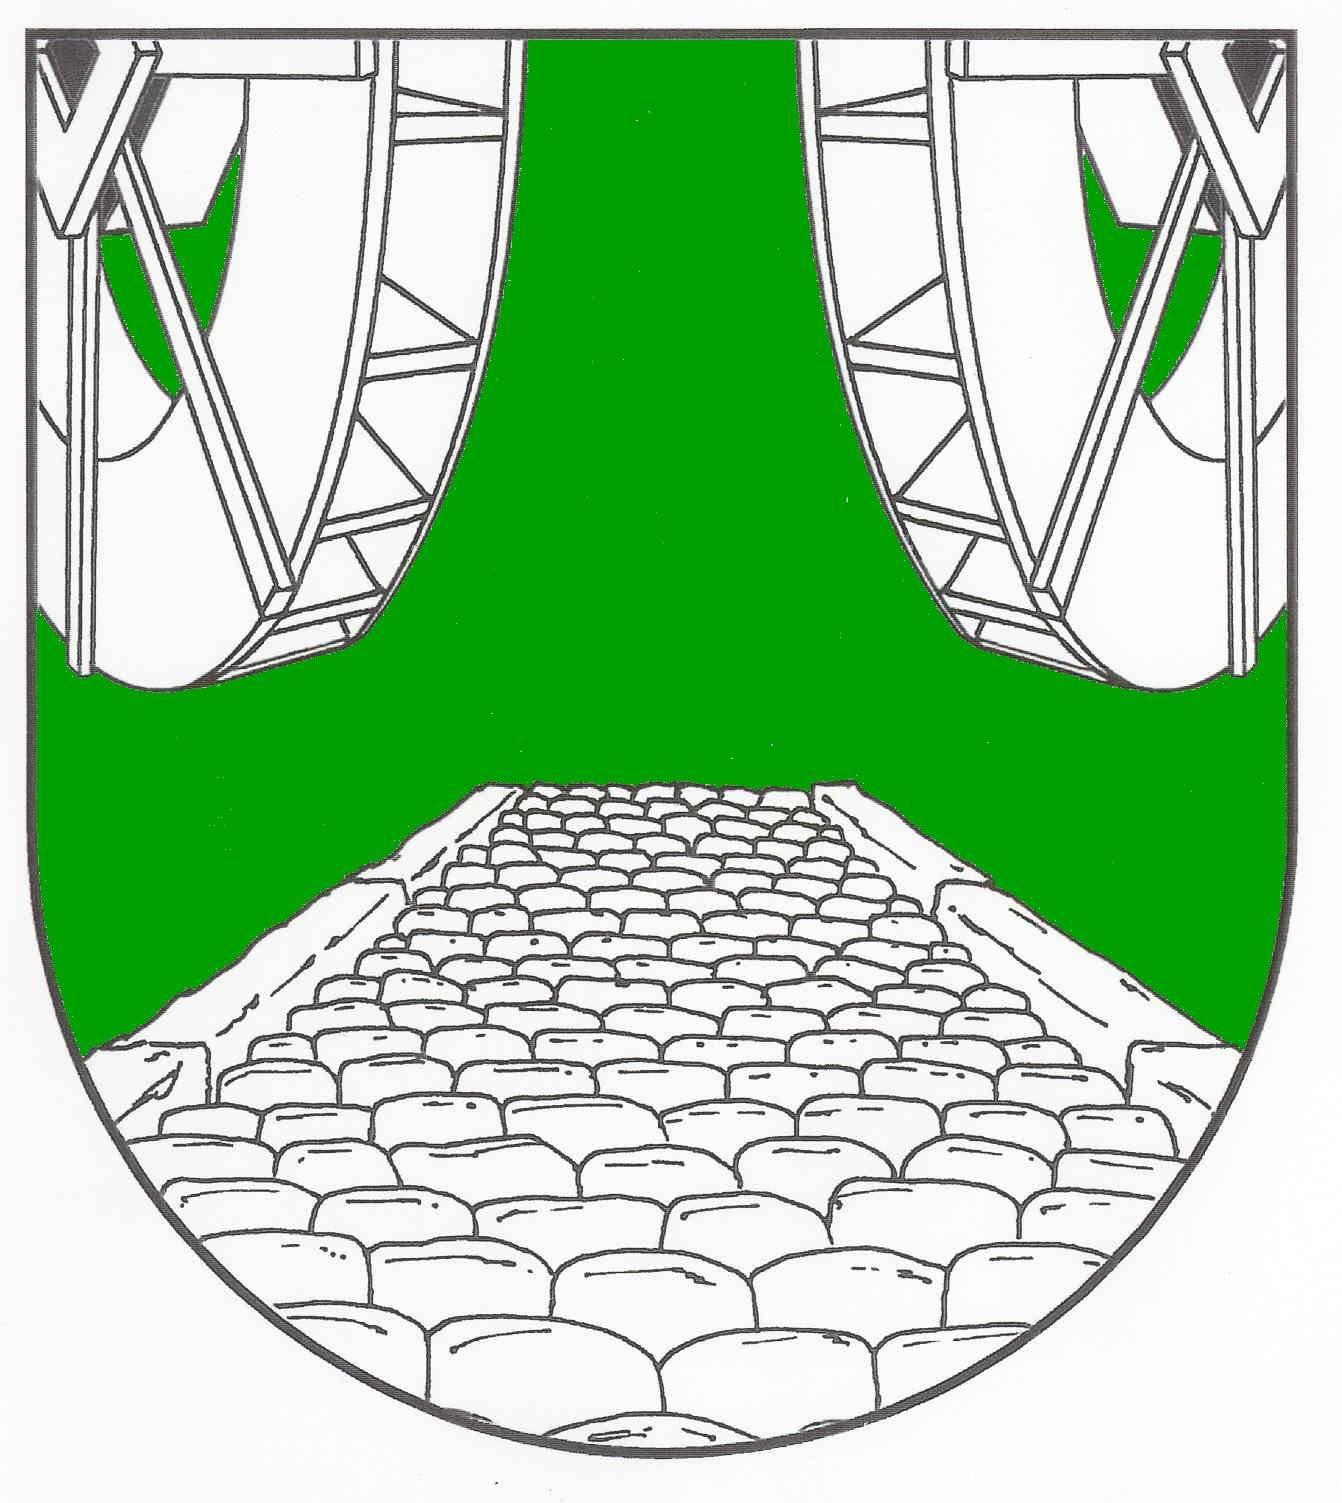 Wappen GemeindeRümpel, Kreis Stormarn